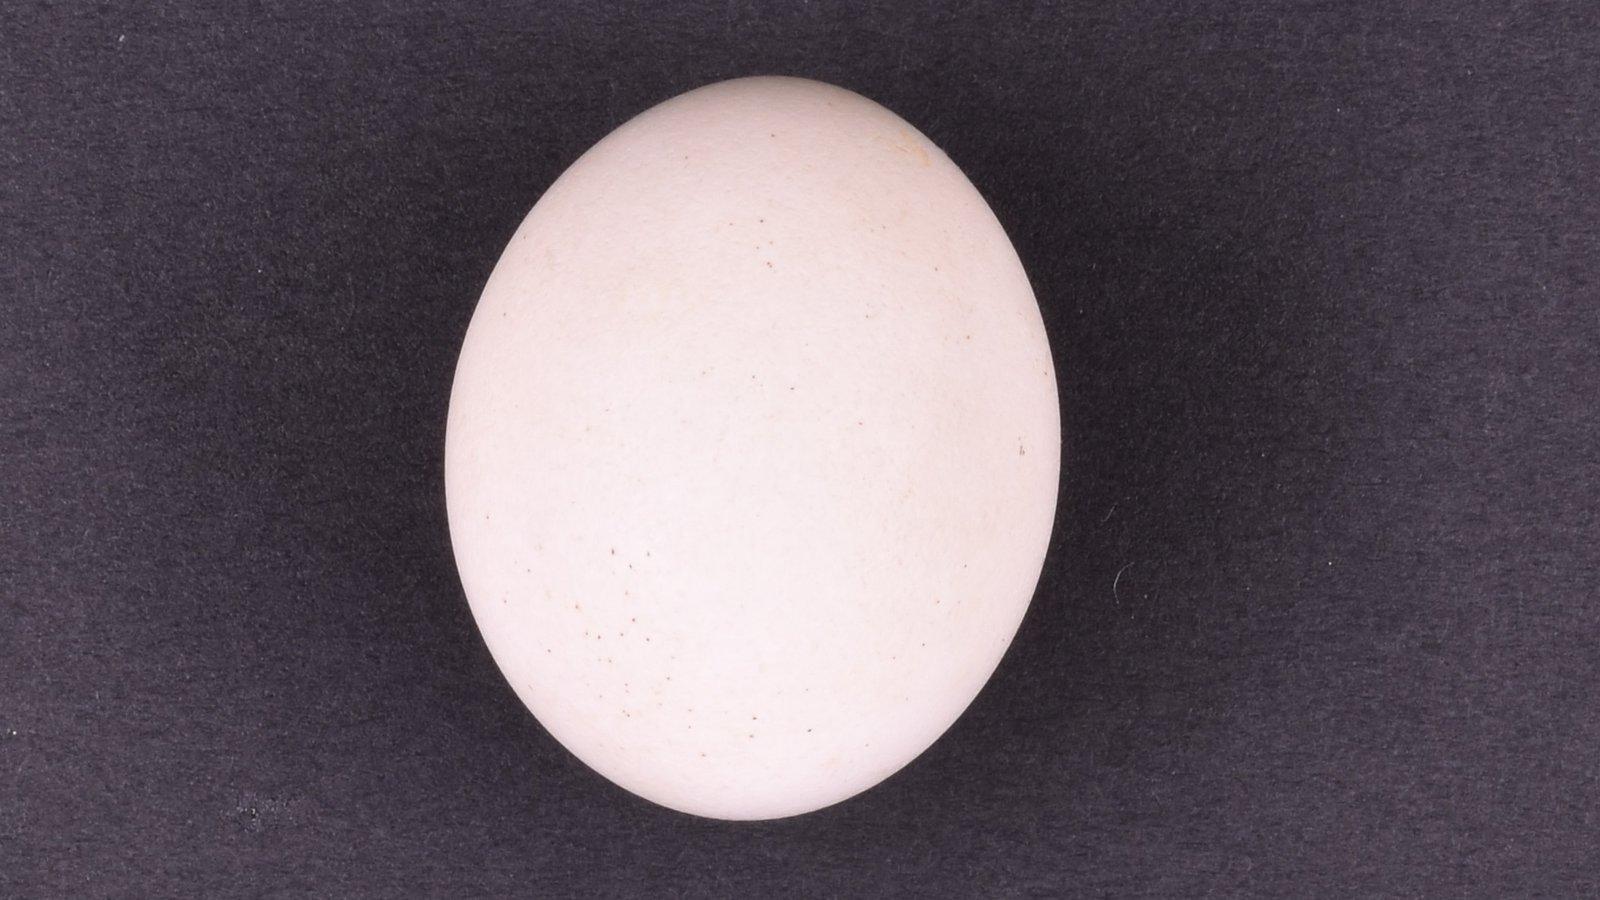 Eastern Rosella (Platycercus eximius) egg